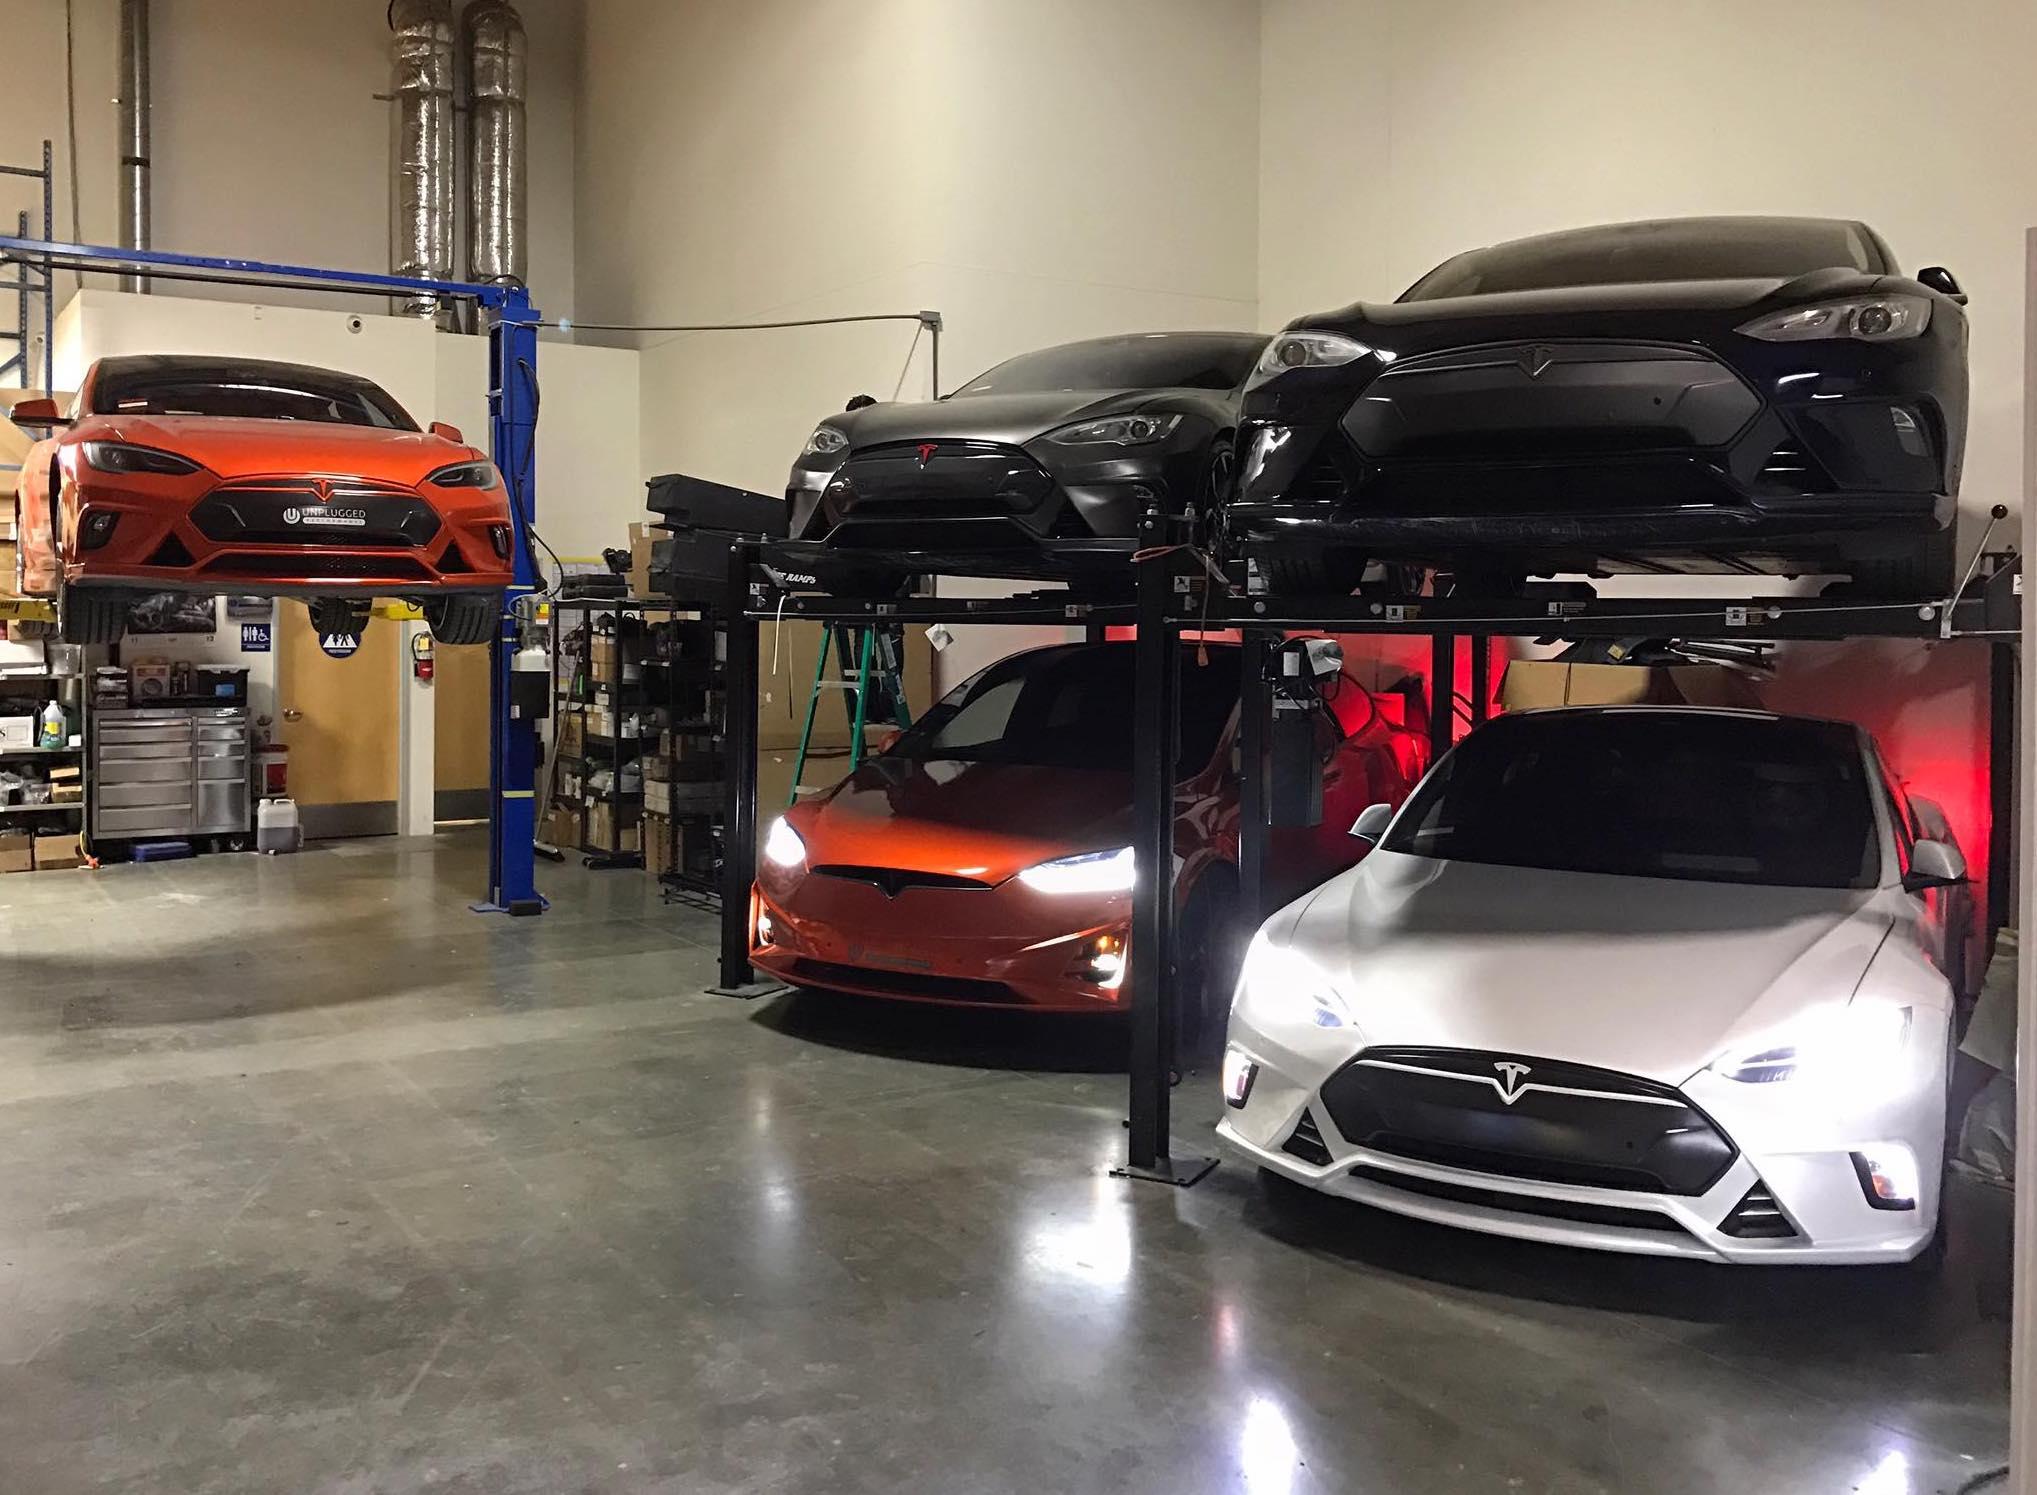 Unplugged-Performance-tuner-Tesla-fleet